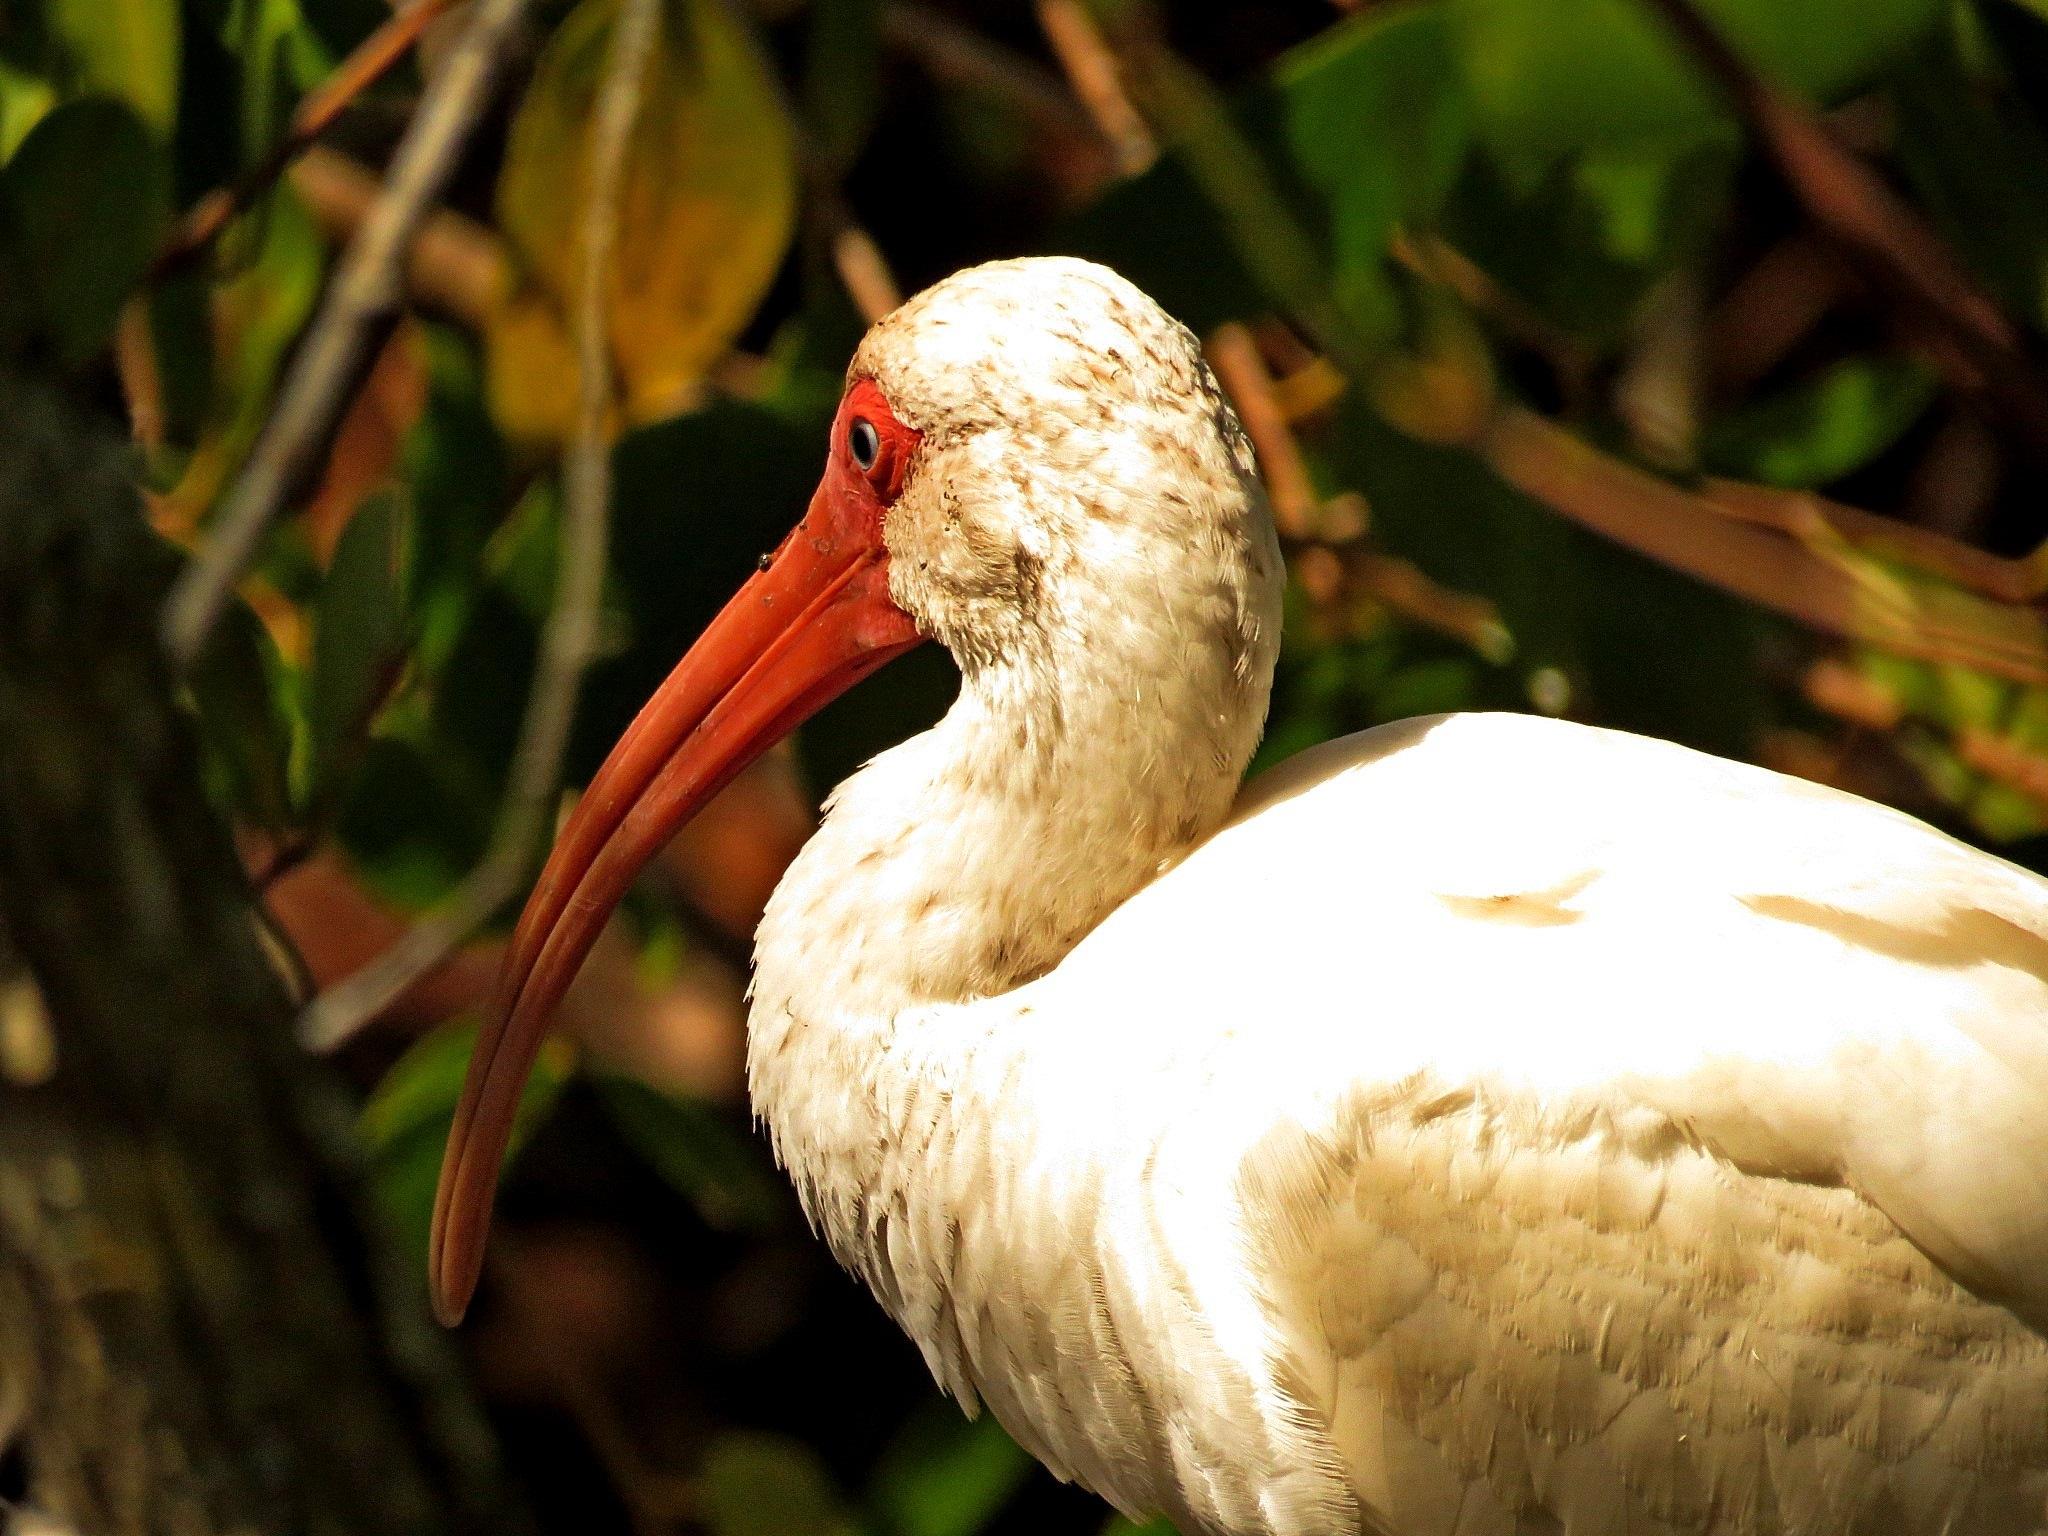 White Ibis by Wayne T. 'tom' Helfrich